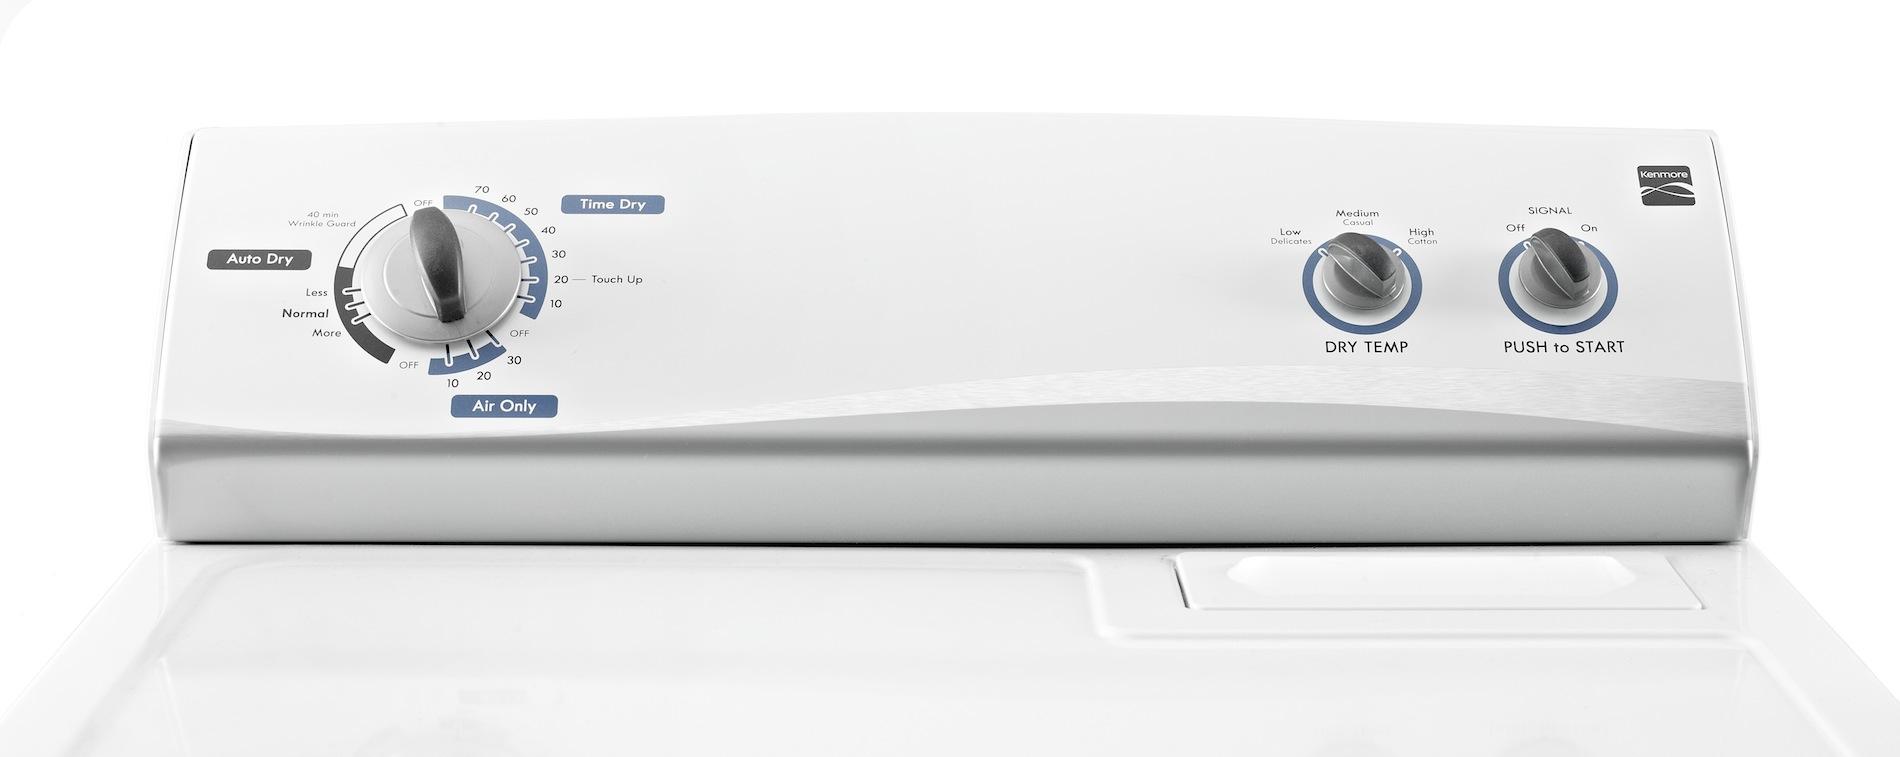 Kenmore 7.0 cu. ft. Gas Dryer w/ Wrinkle Guard® - White